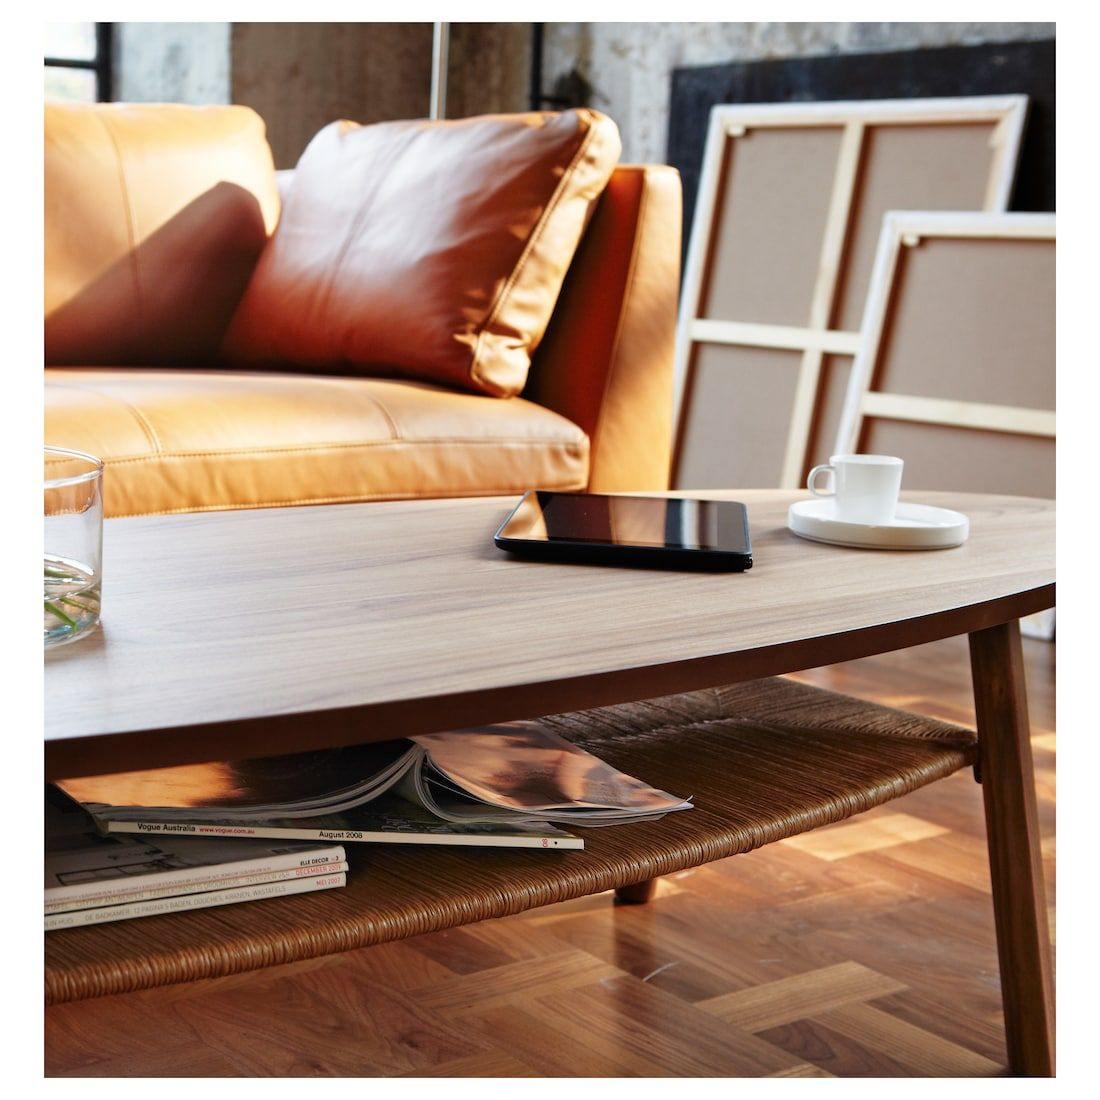 Stockholm Coffee Table Walnut Veneer 70 7 8x23 1 4 With